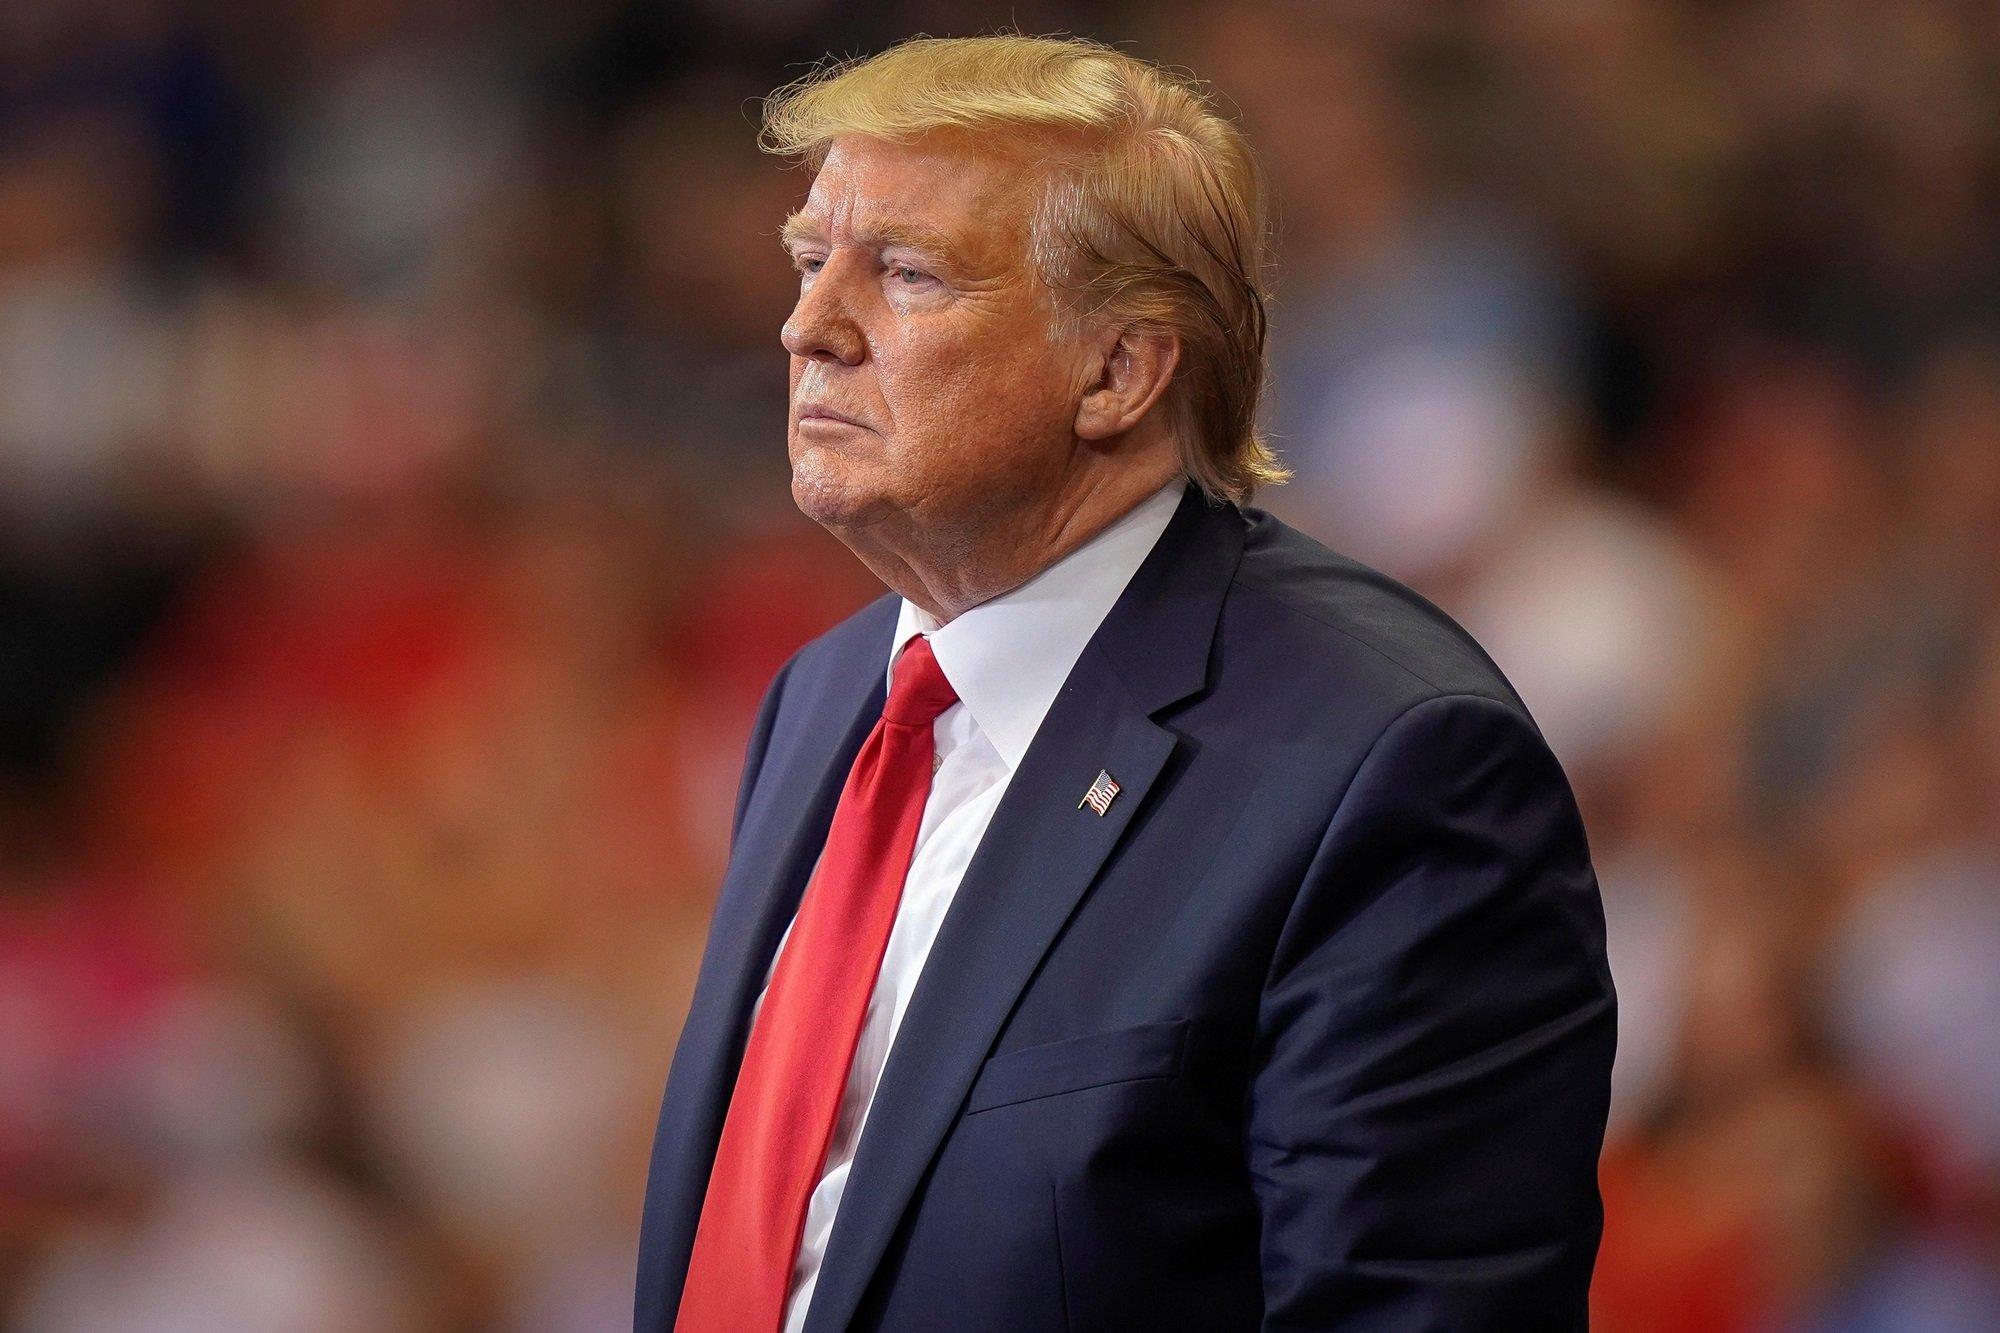 Donald Trump Pat Robertson Syria